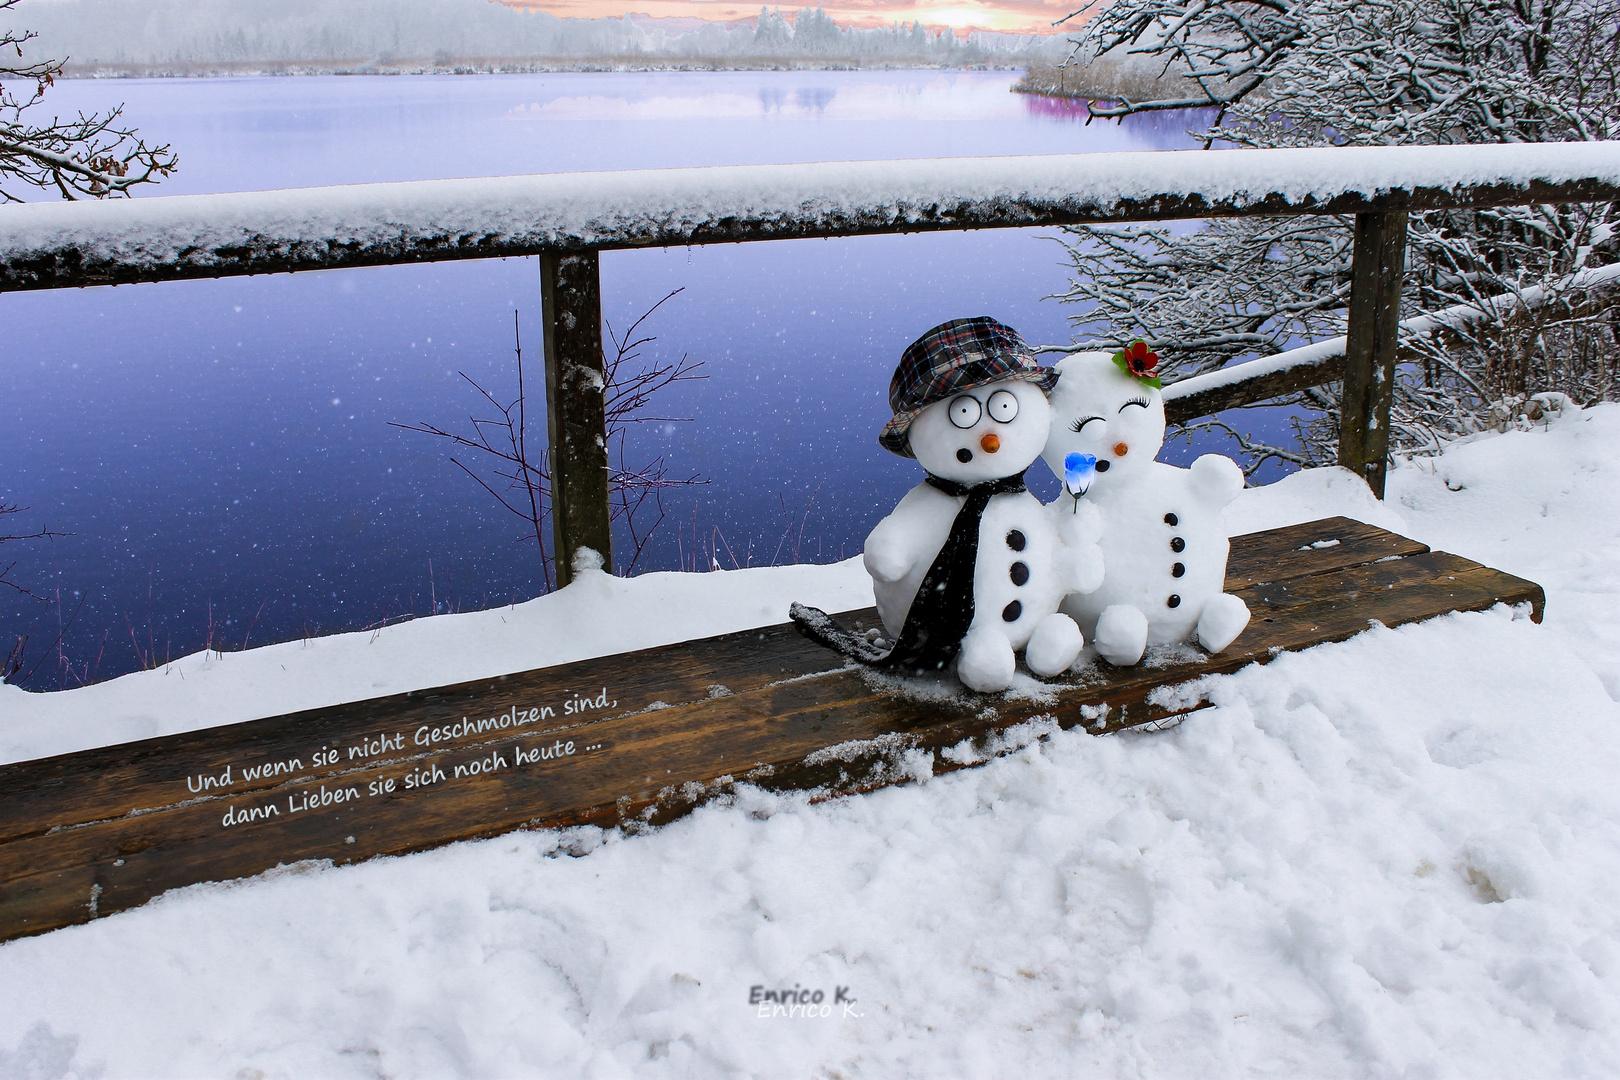 SnowMan in Love ^^